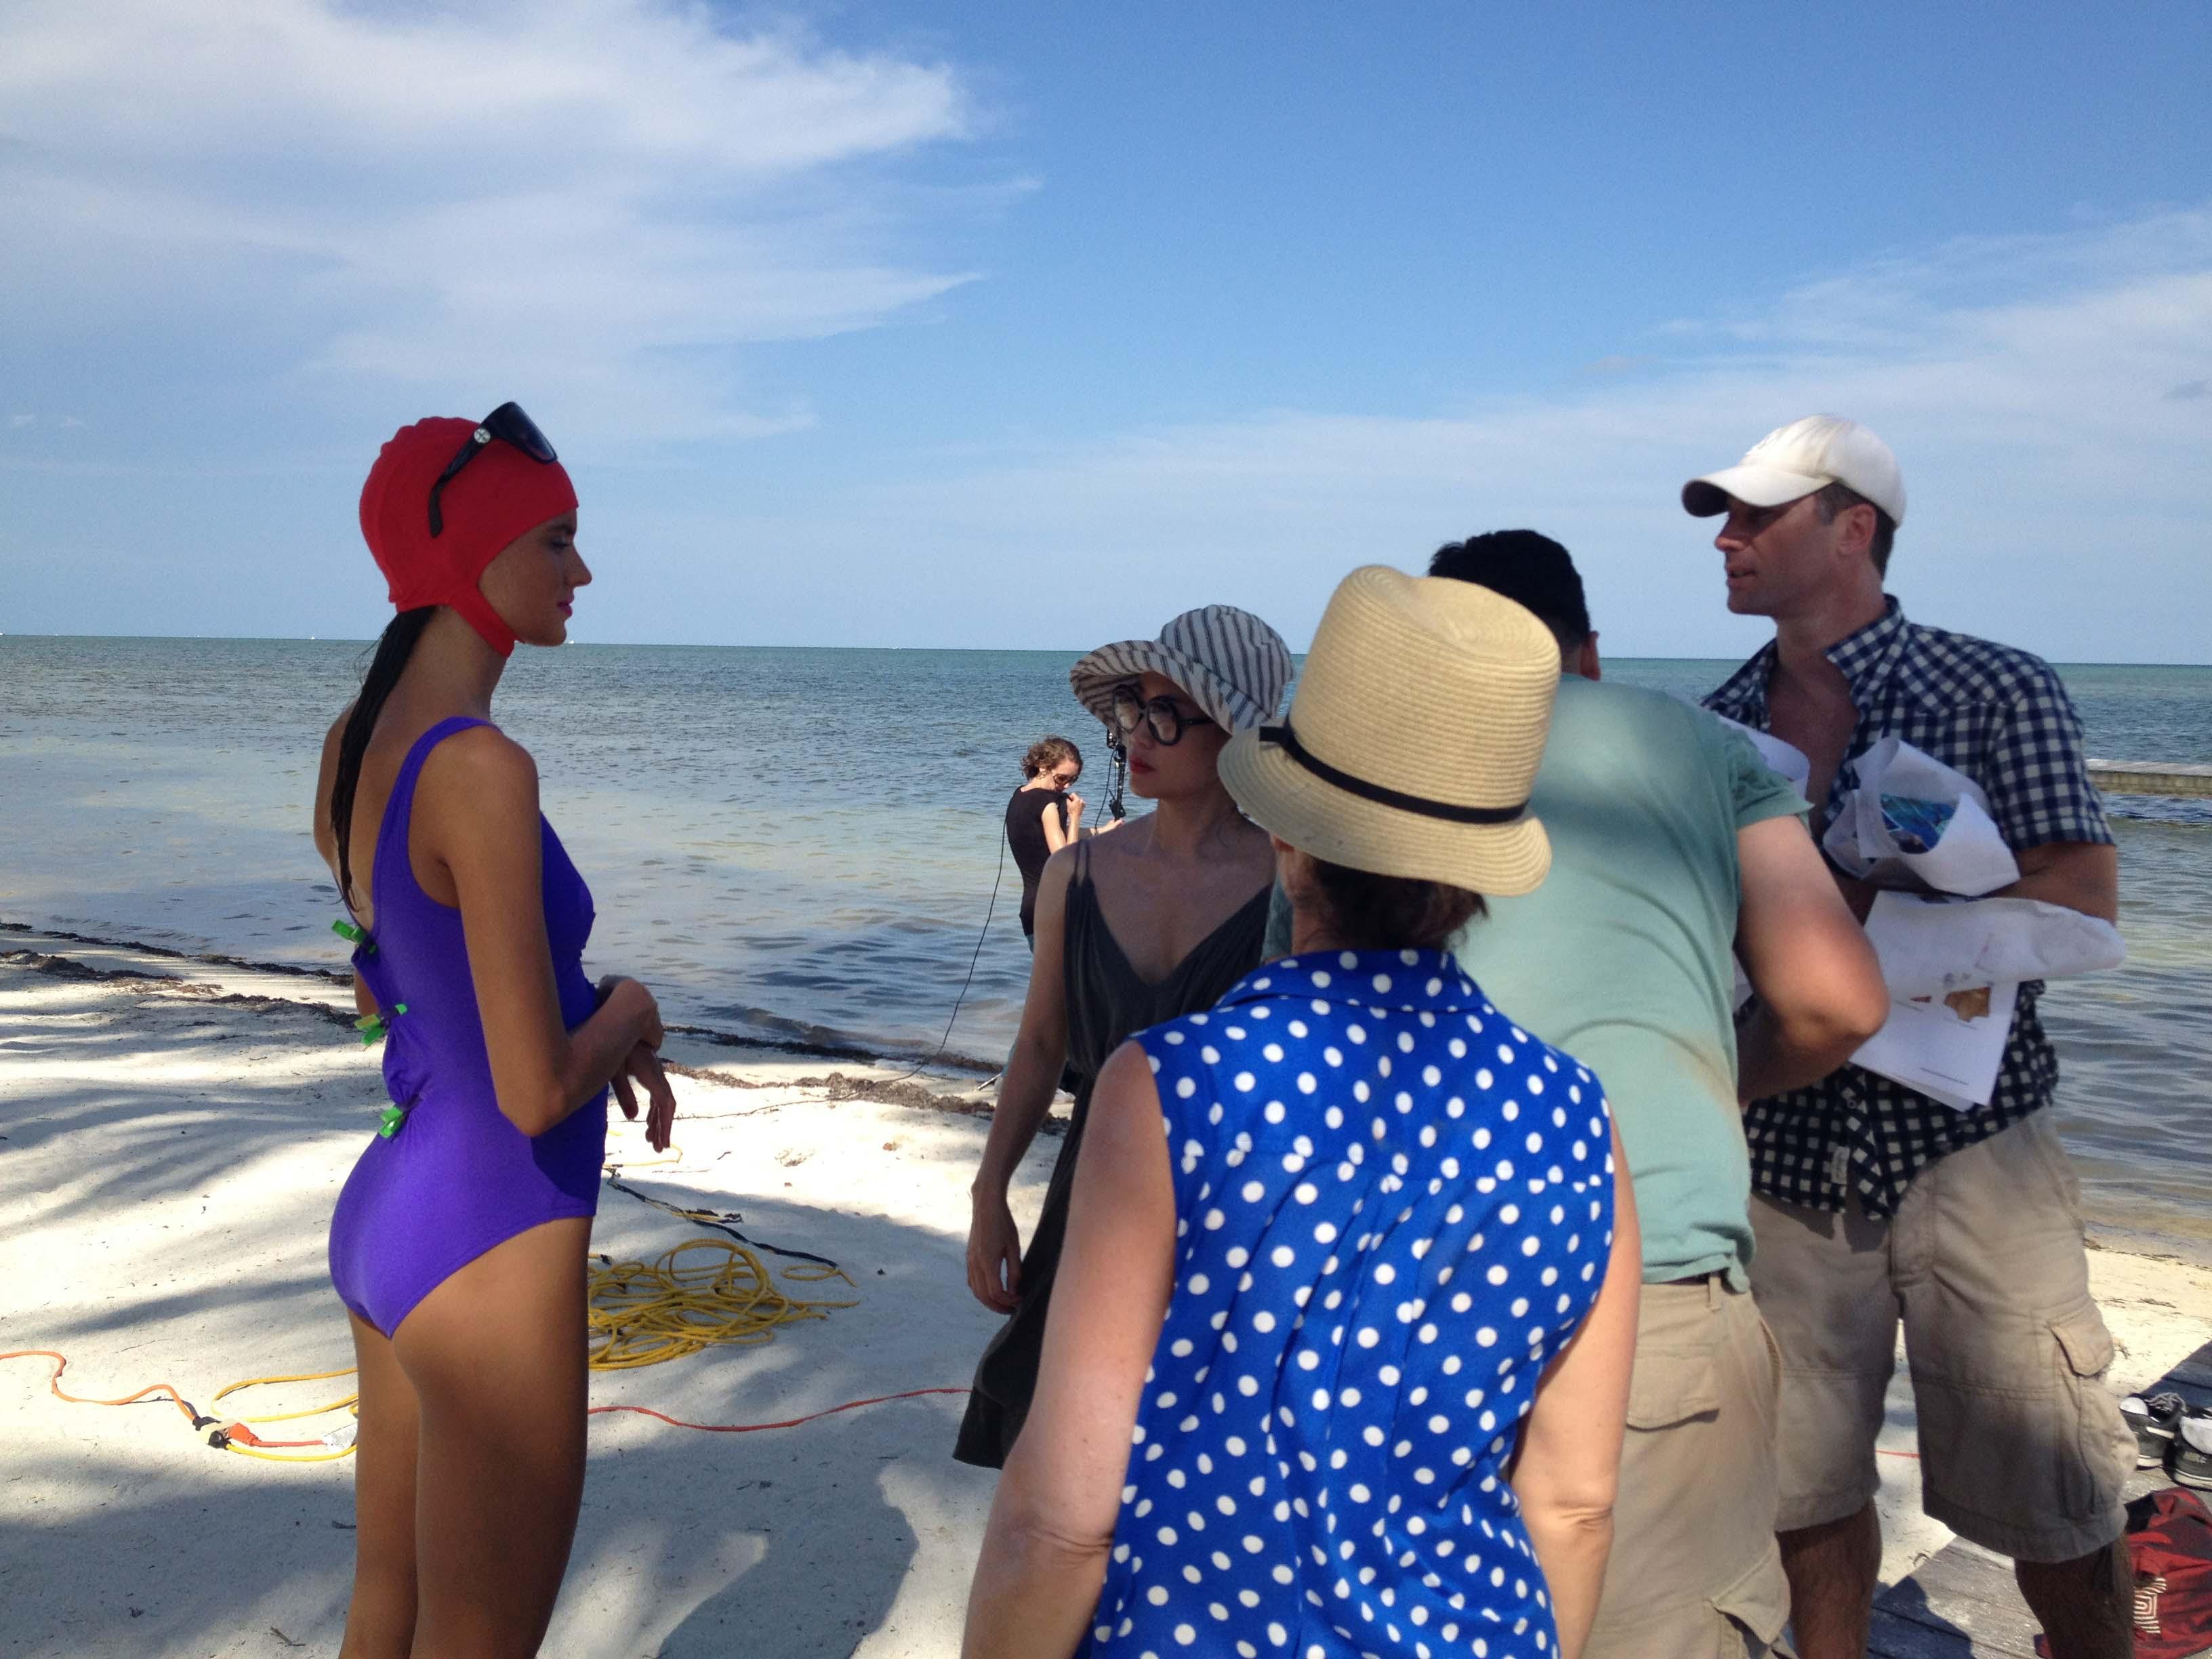 Karla Colletto on location in Islamorada, FL